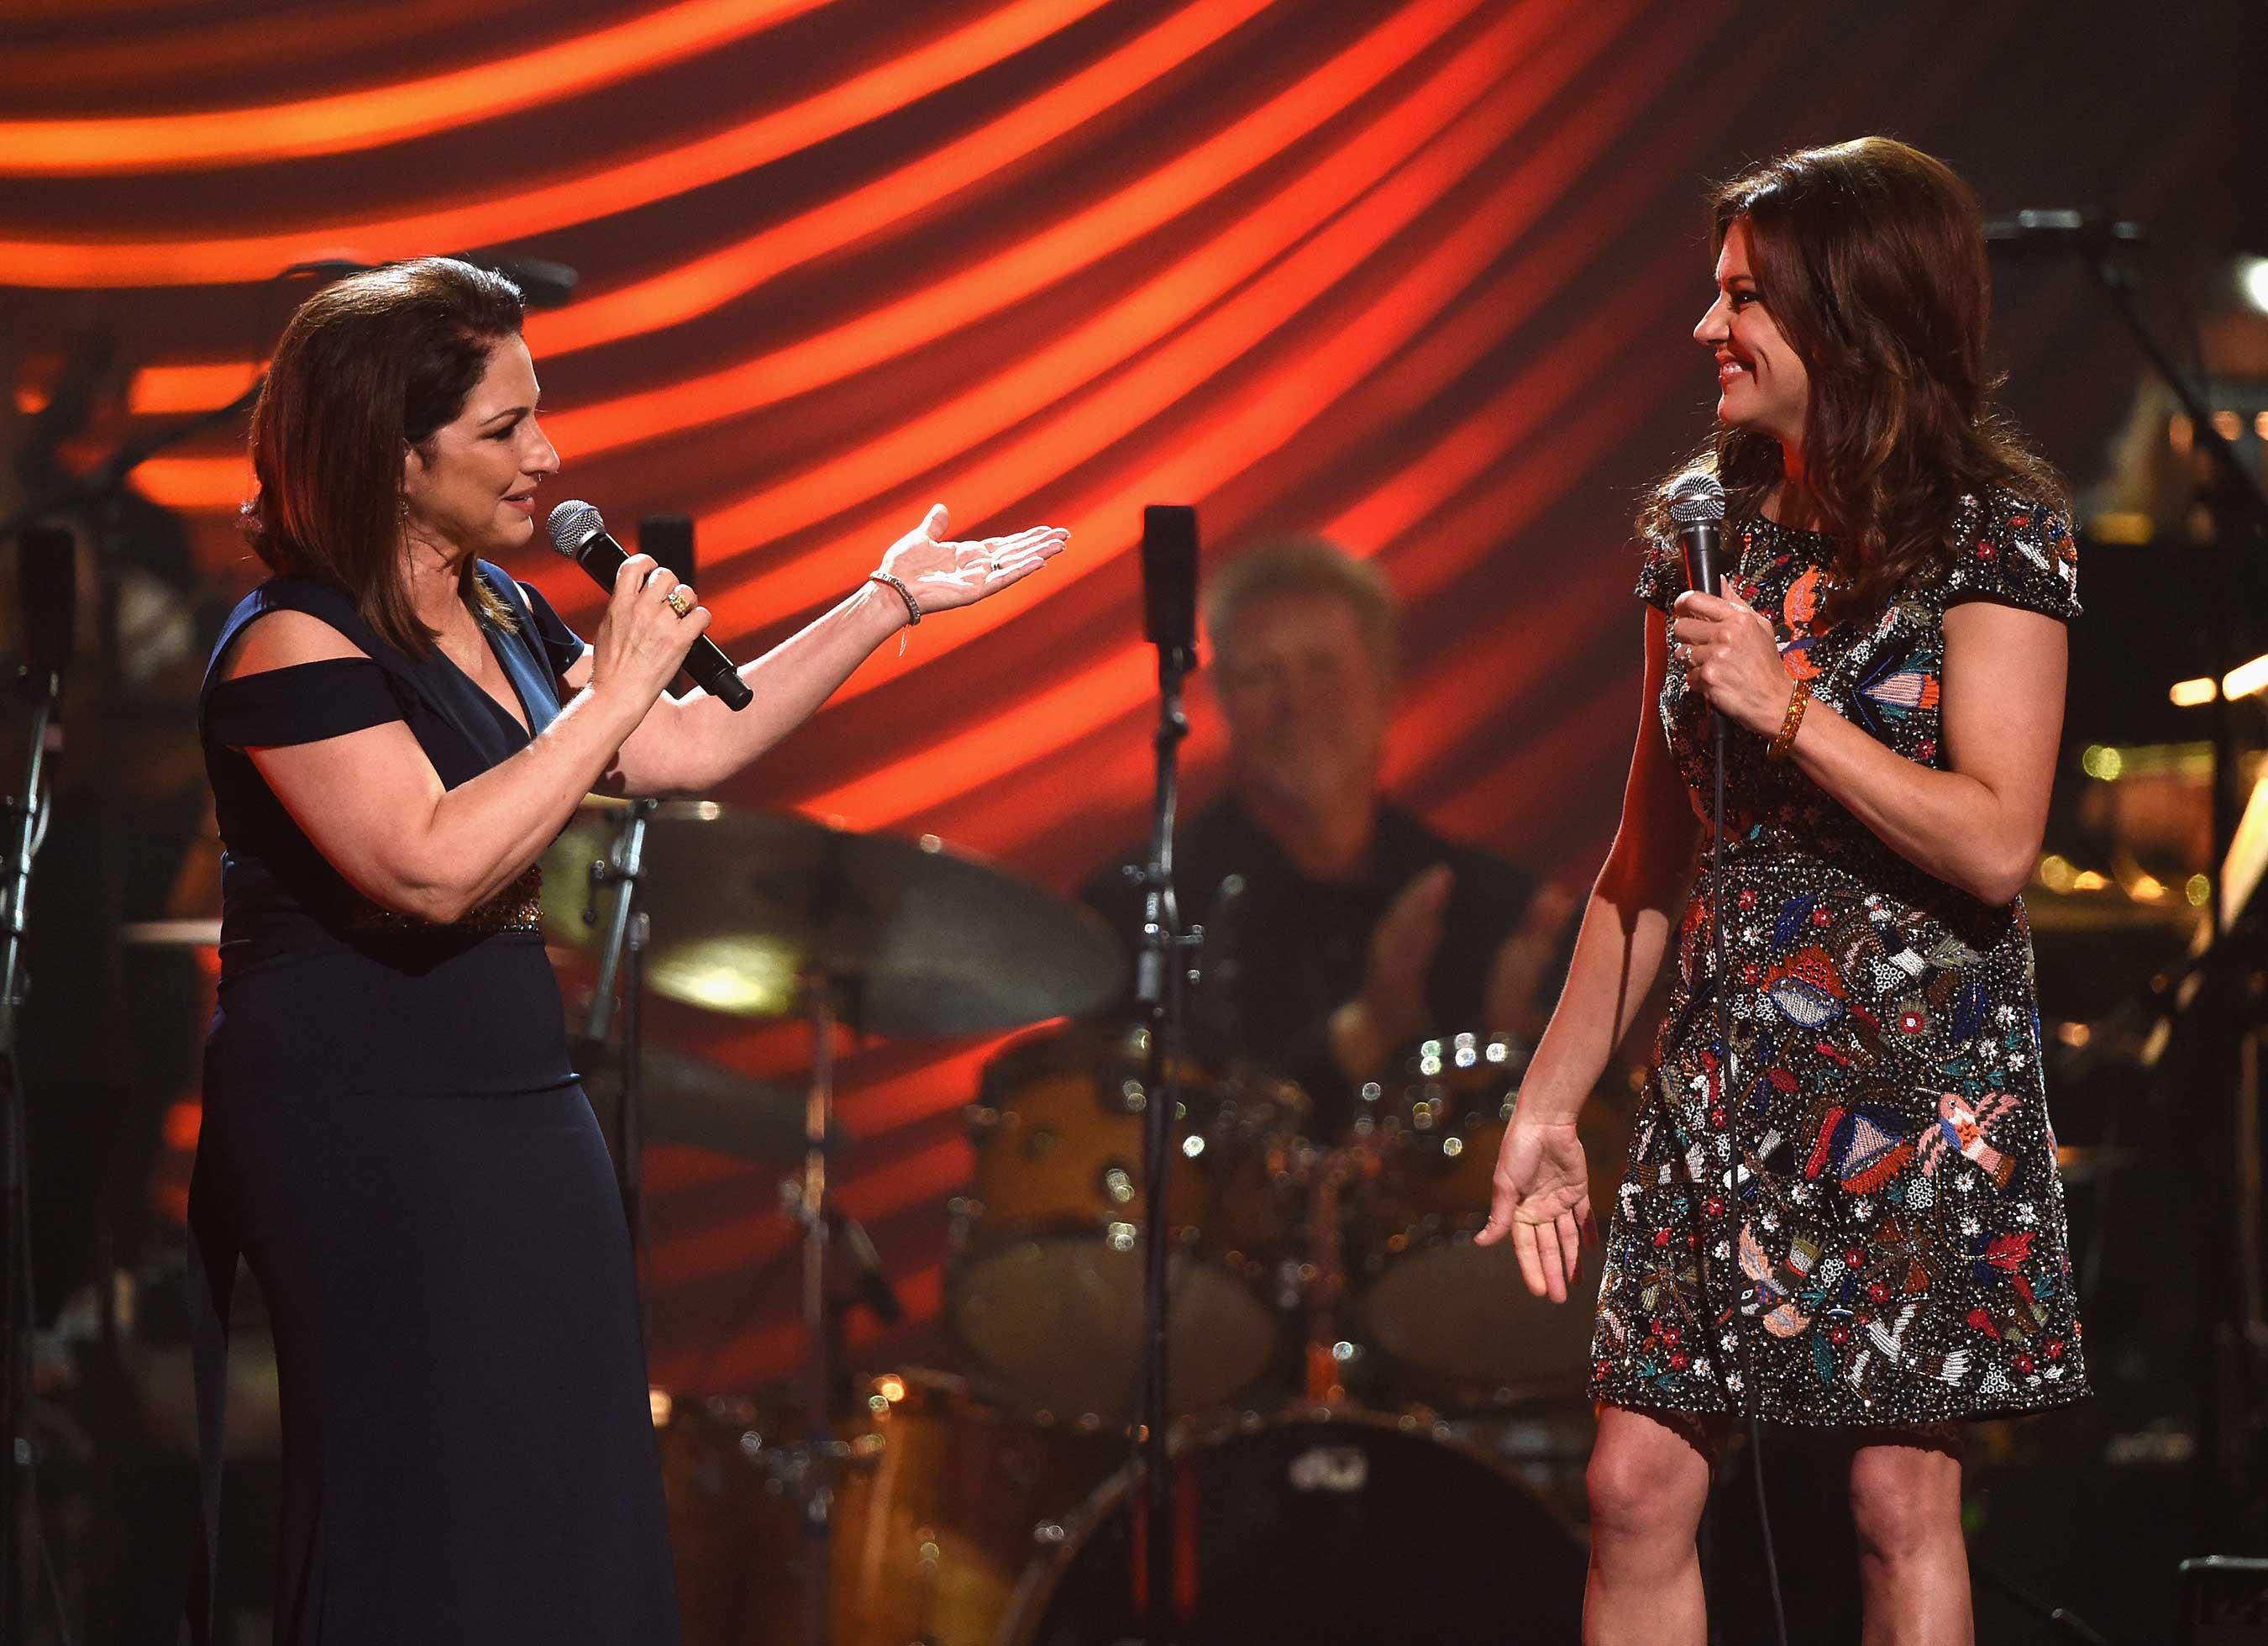 Gloria Estefan & Martina McBride perform at Keep Memory Alive's Power of Love Gala (E Miller June 13, 2015)